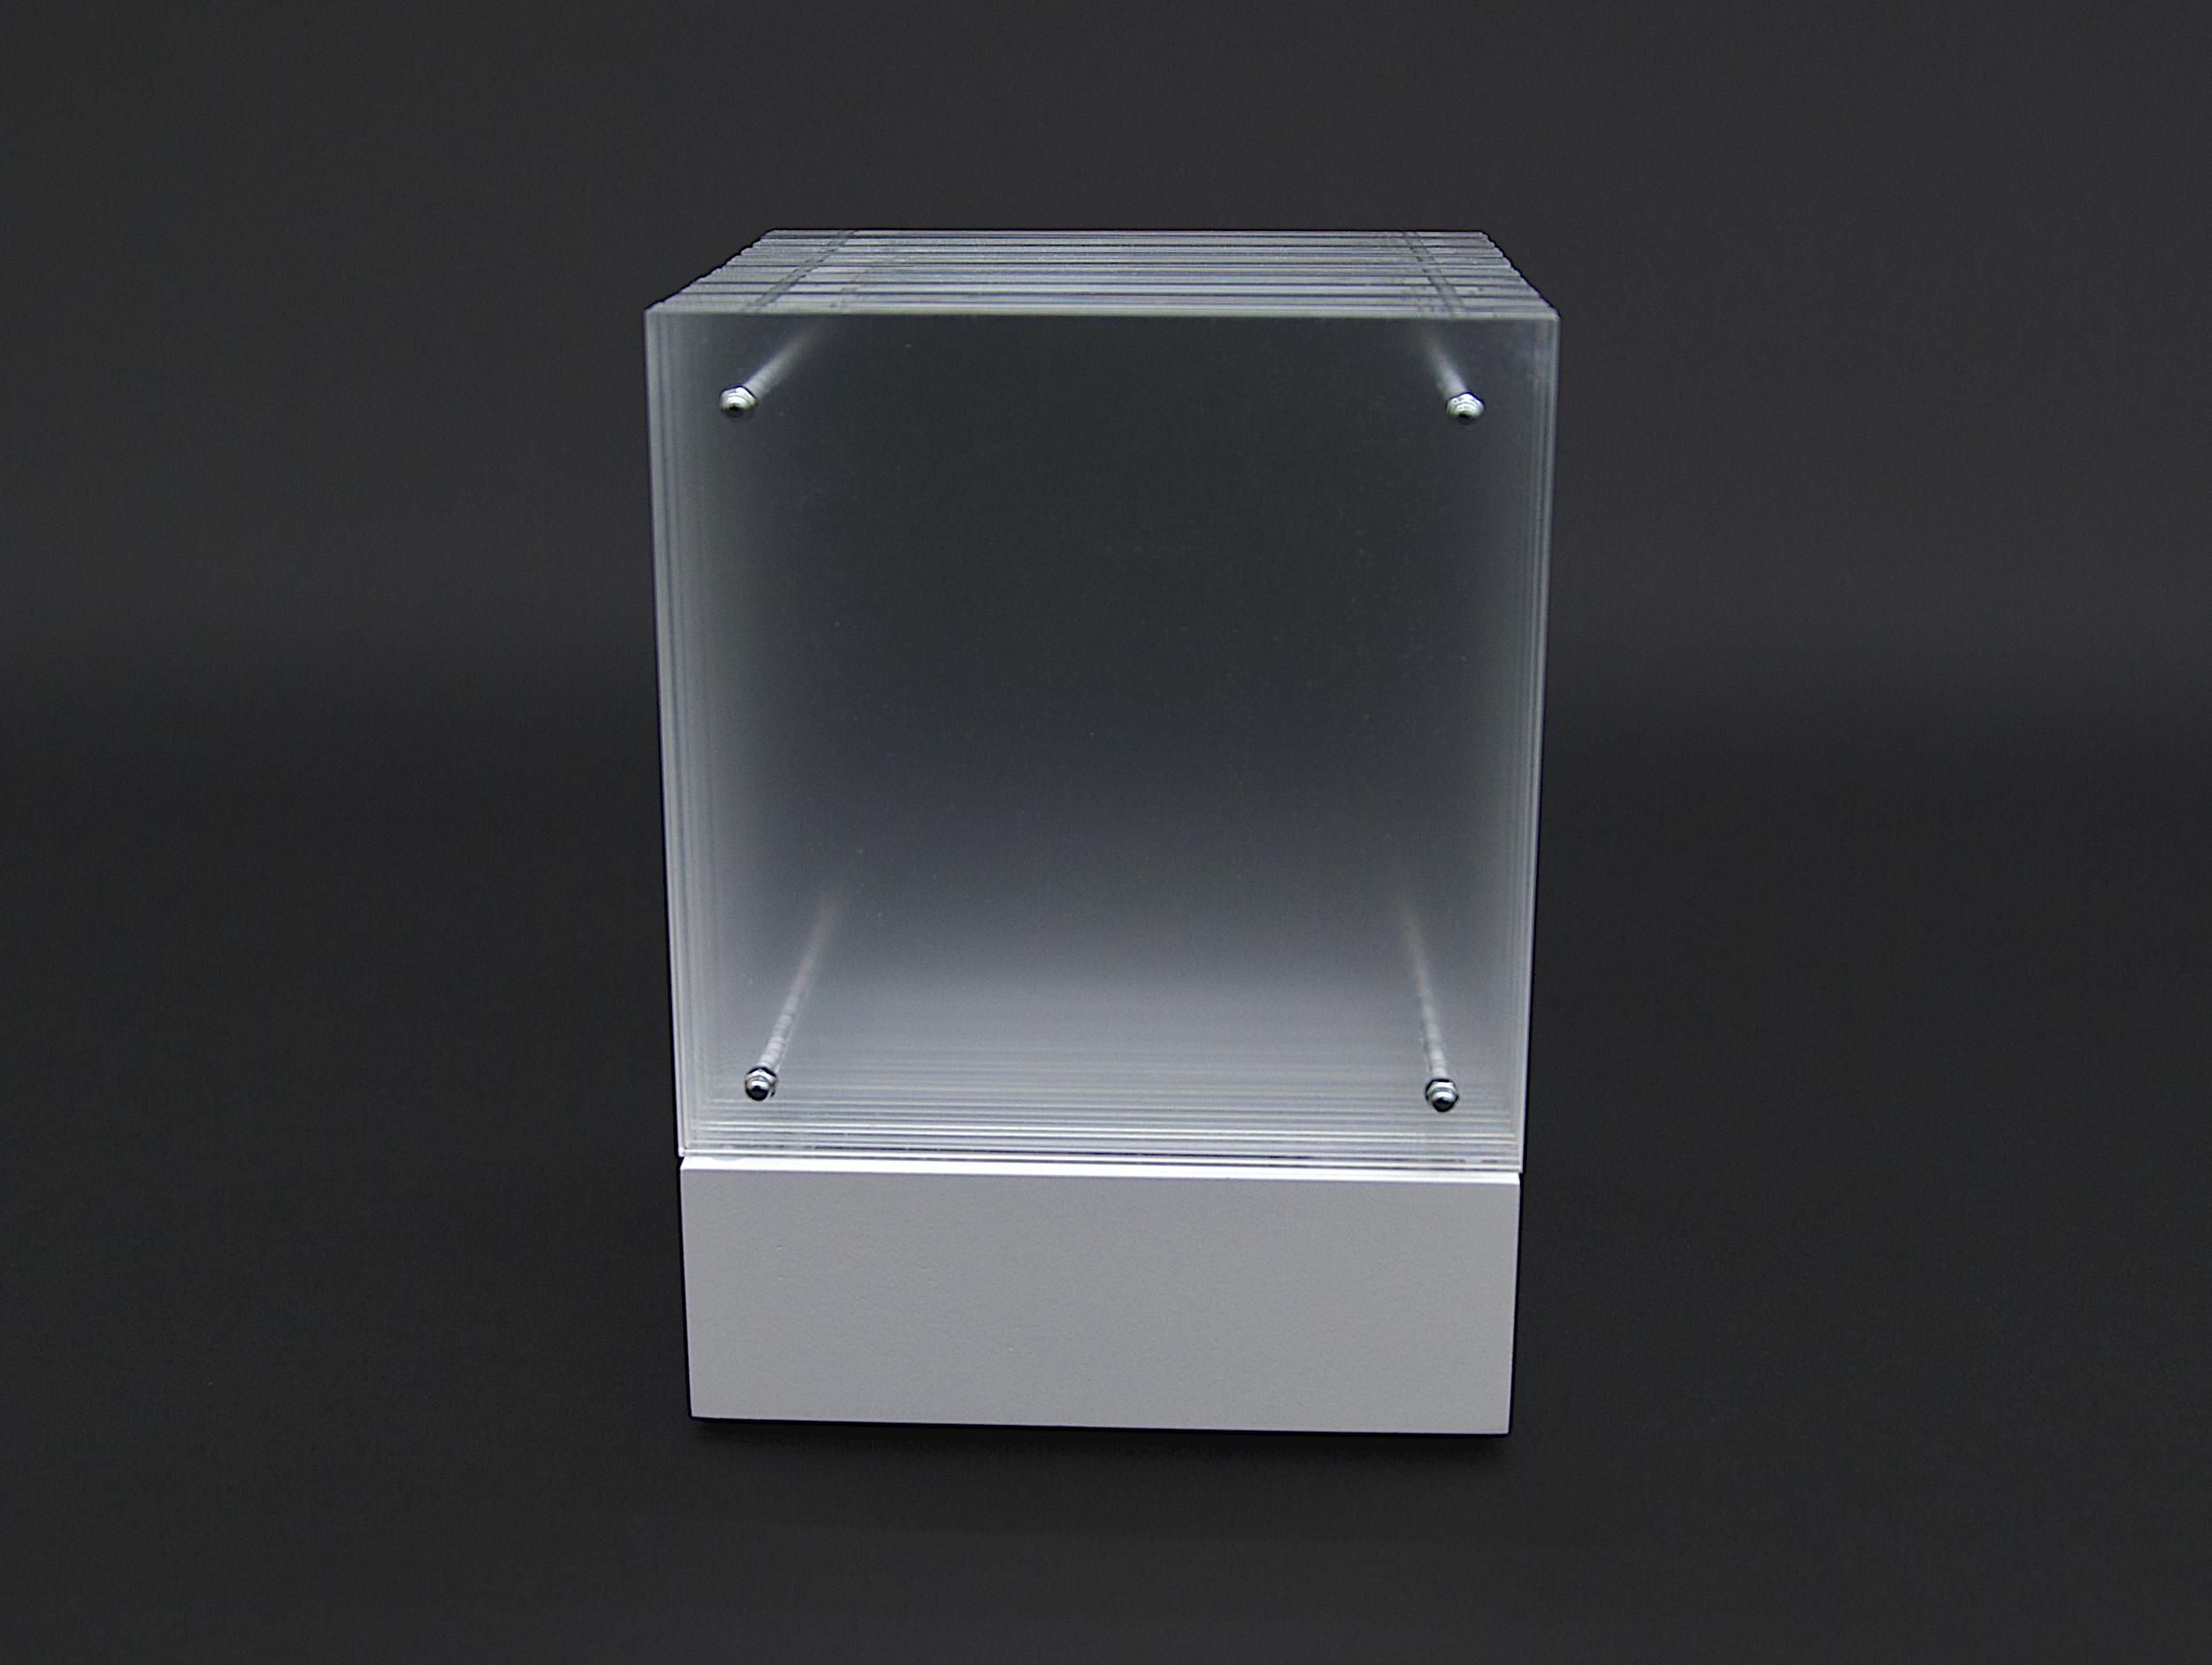 objekt nr. 03/2010- acrylglas bemalt - 15 x 15 x 15 cmauf drehbarem sockel